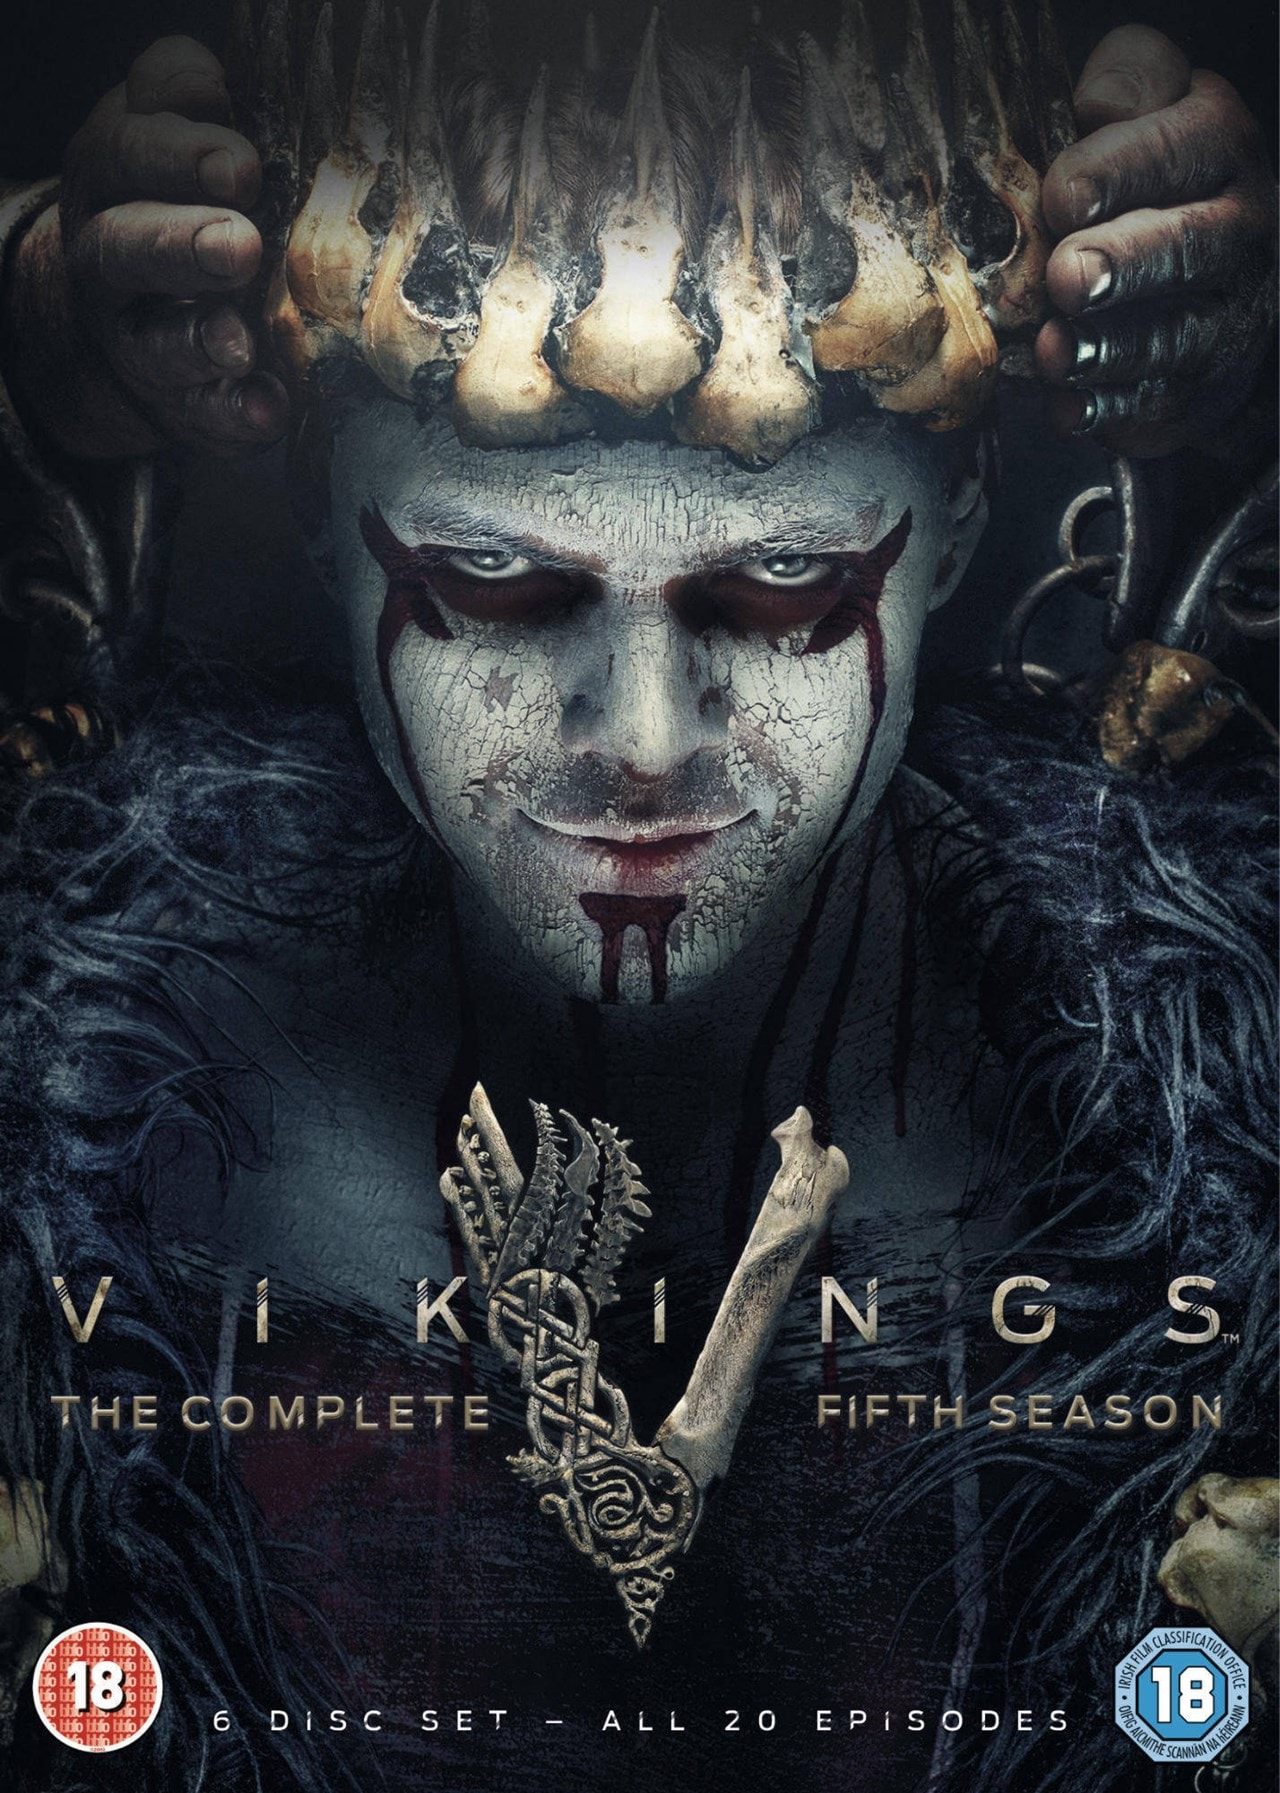 Vikings: The Complete Fifth Season - 1